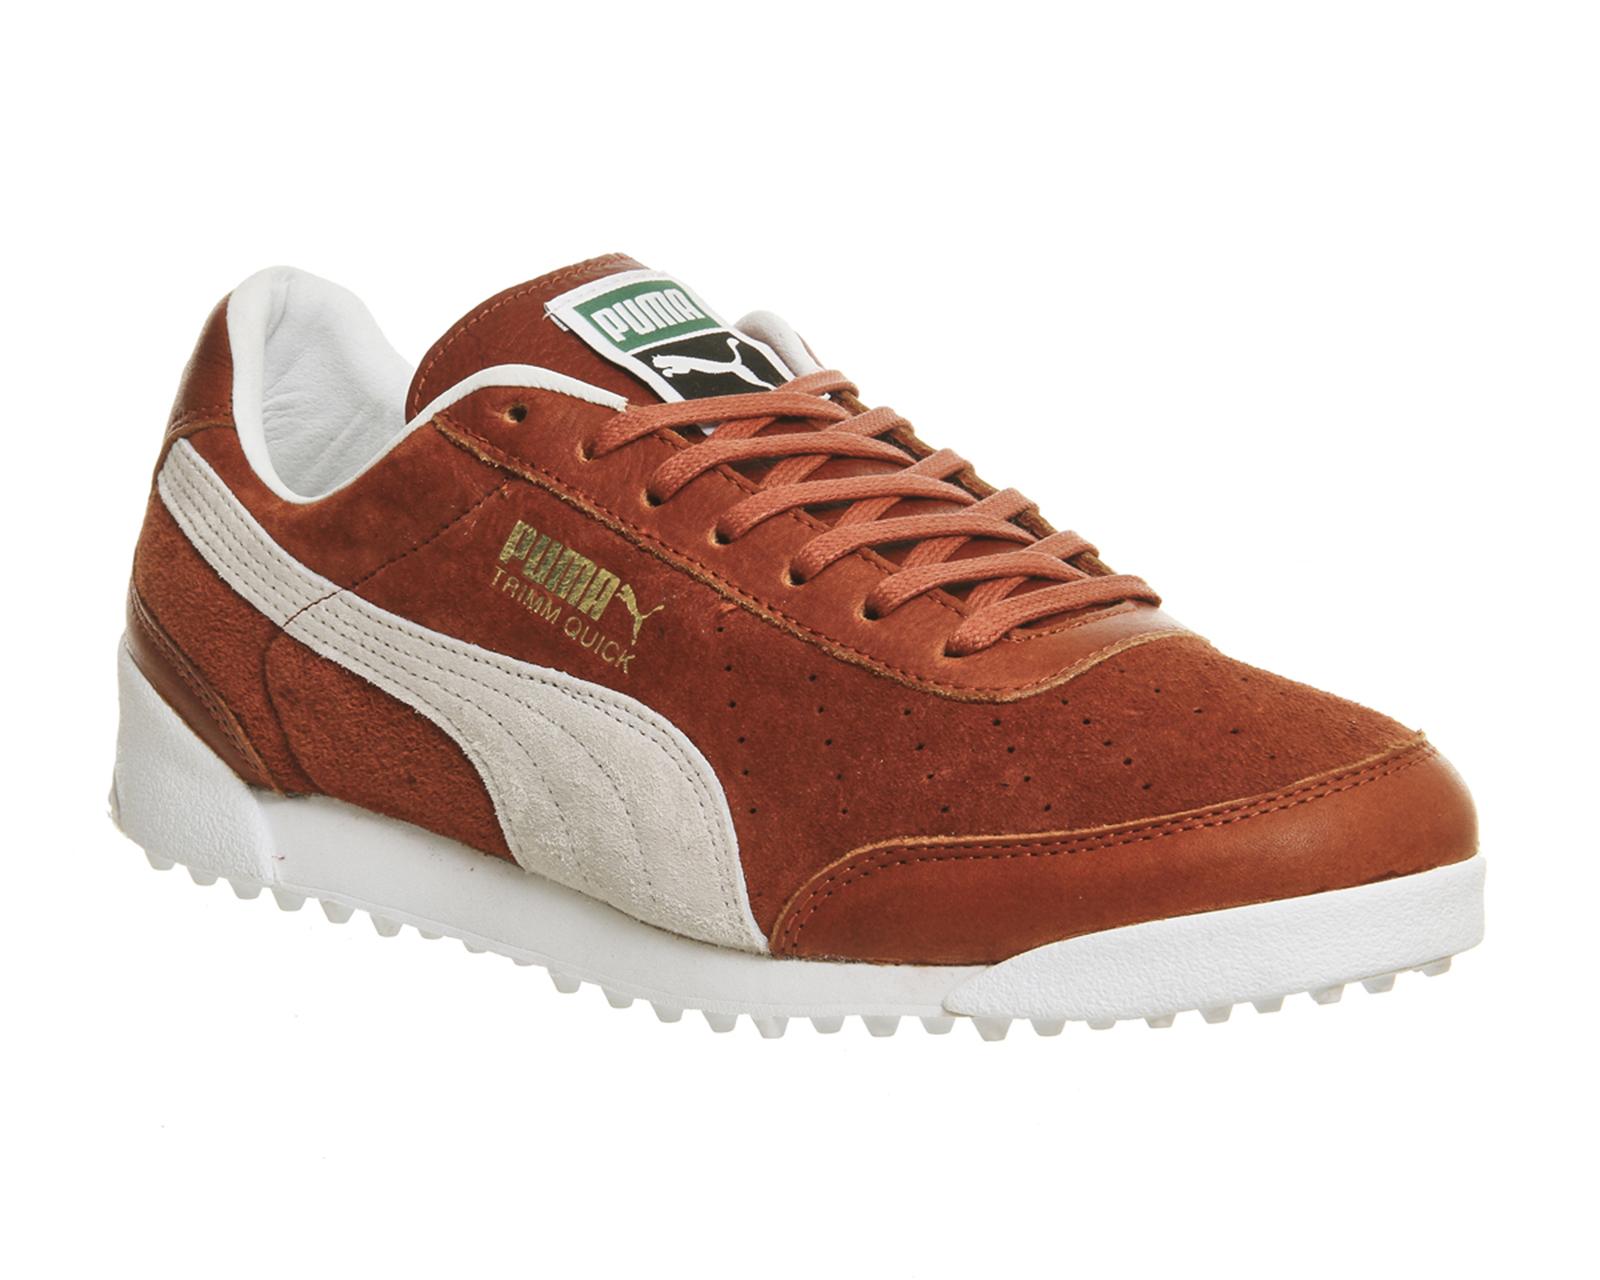 Mens-Puma-Trimm-Quick-PICANTE-Trainers-Shoes